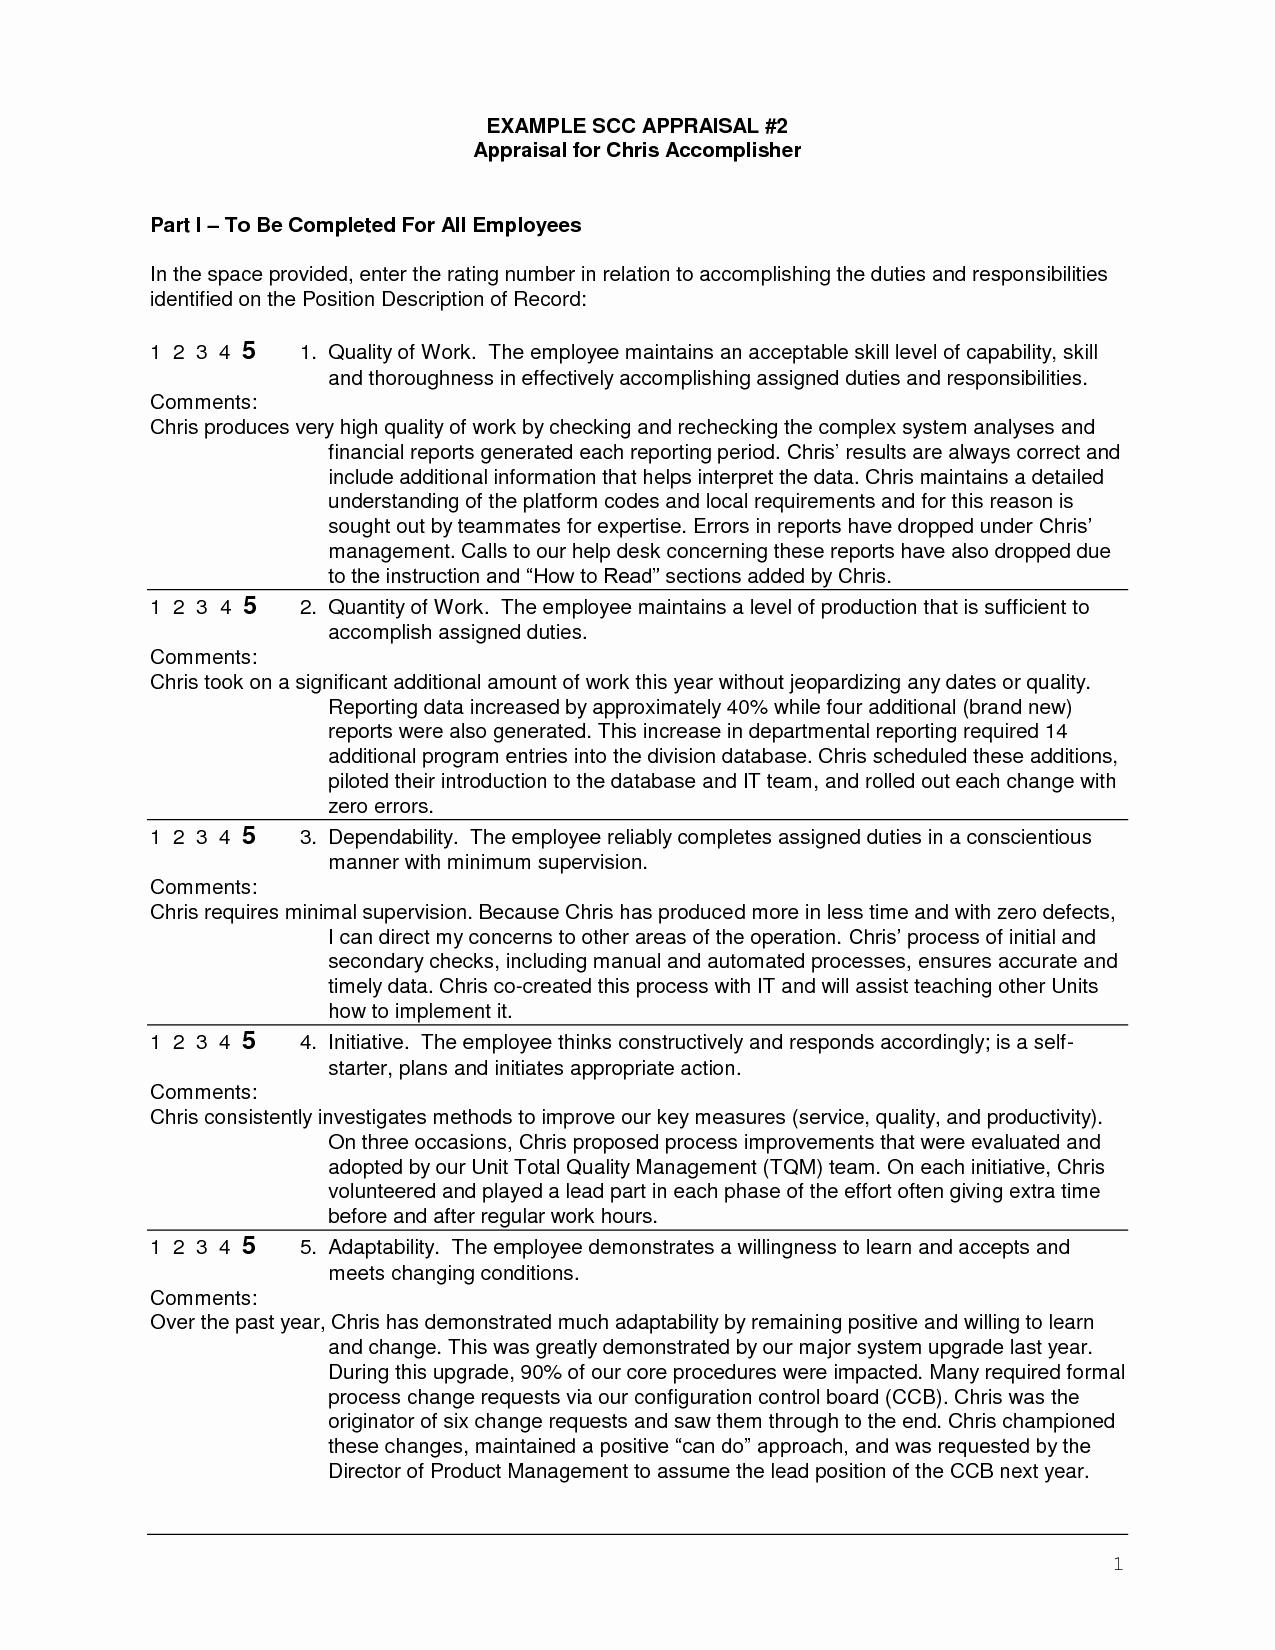 Employee Performance Evaluation Samples Unique Sample Employee Evaluation Written by Manager Google